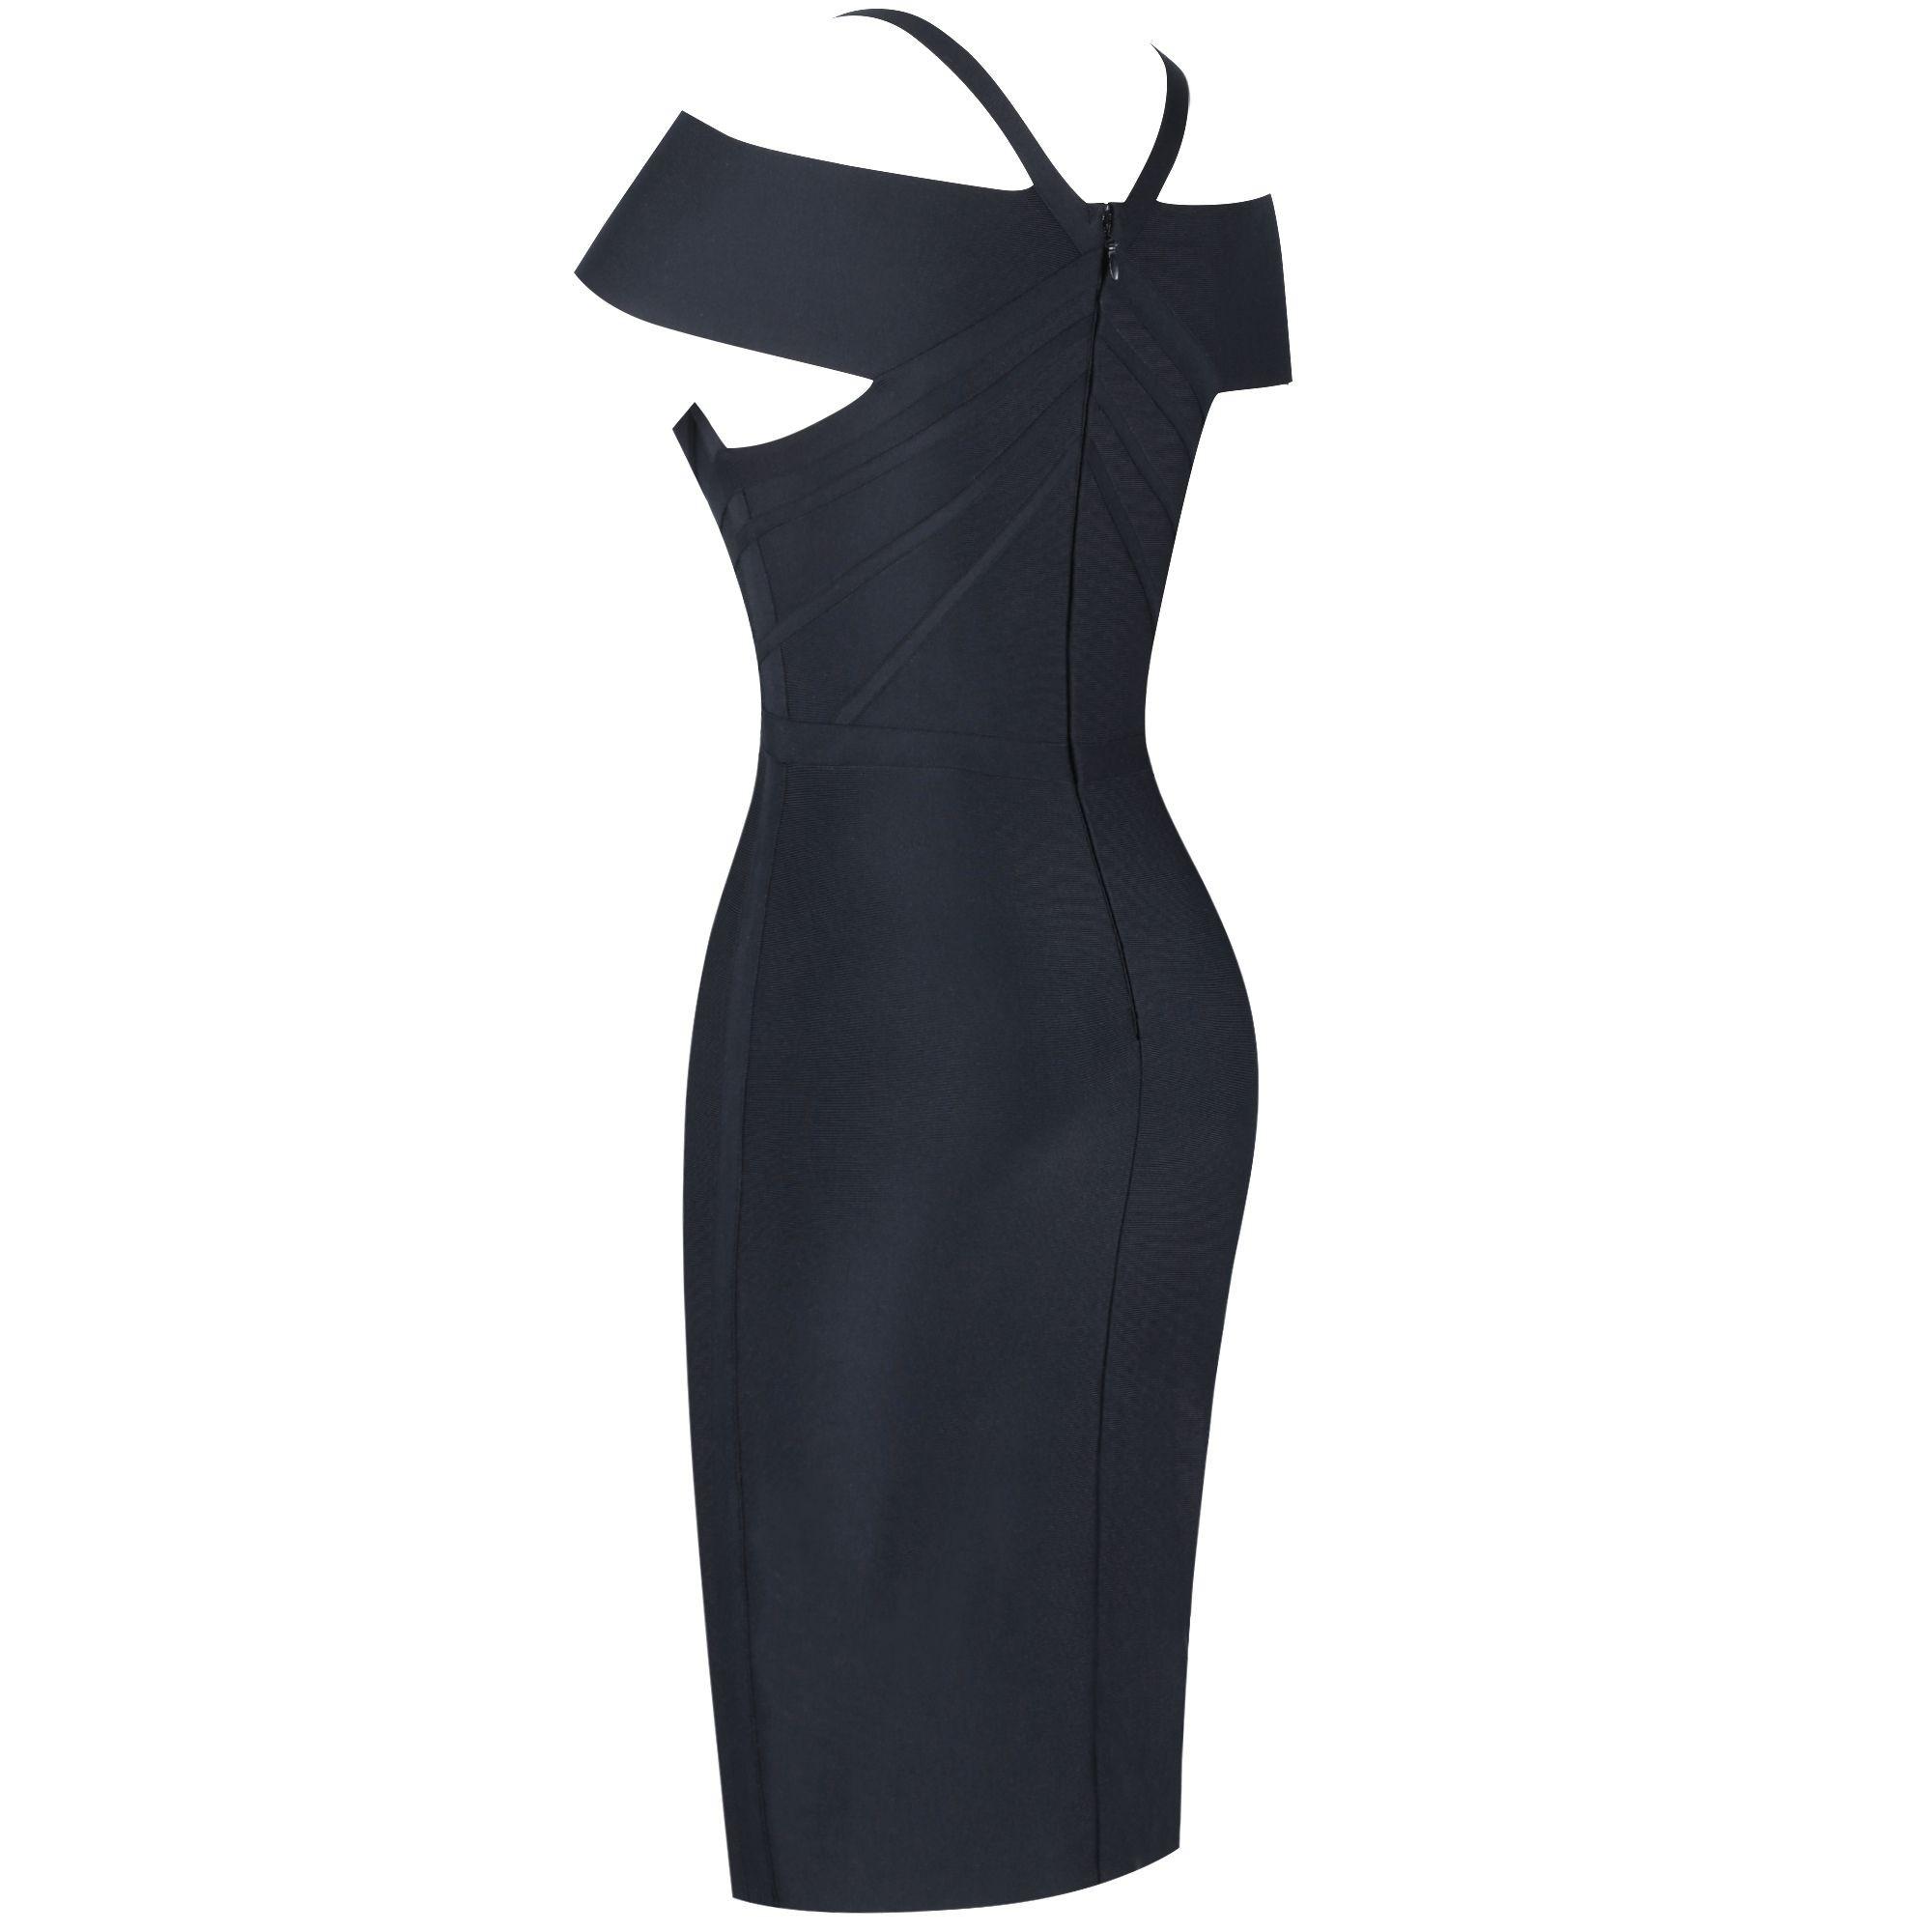 Black Striped Over Knee Short Sleeve Strapy Bandage Dress PF19089-Black